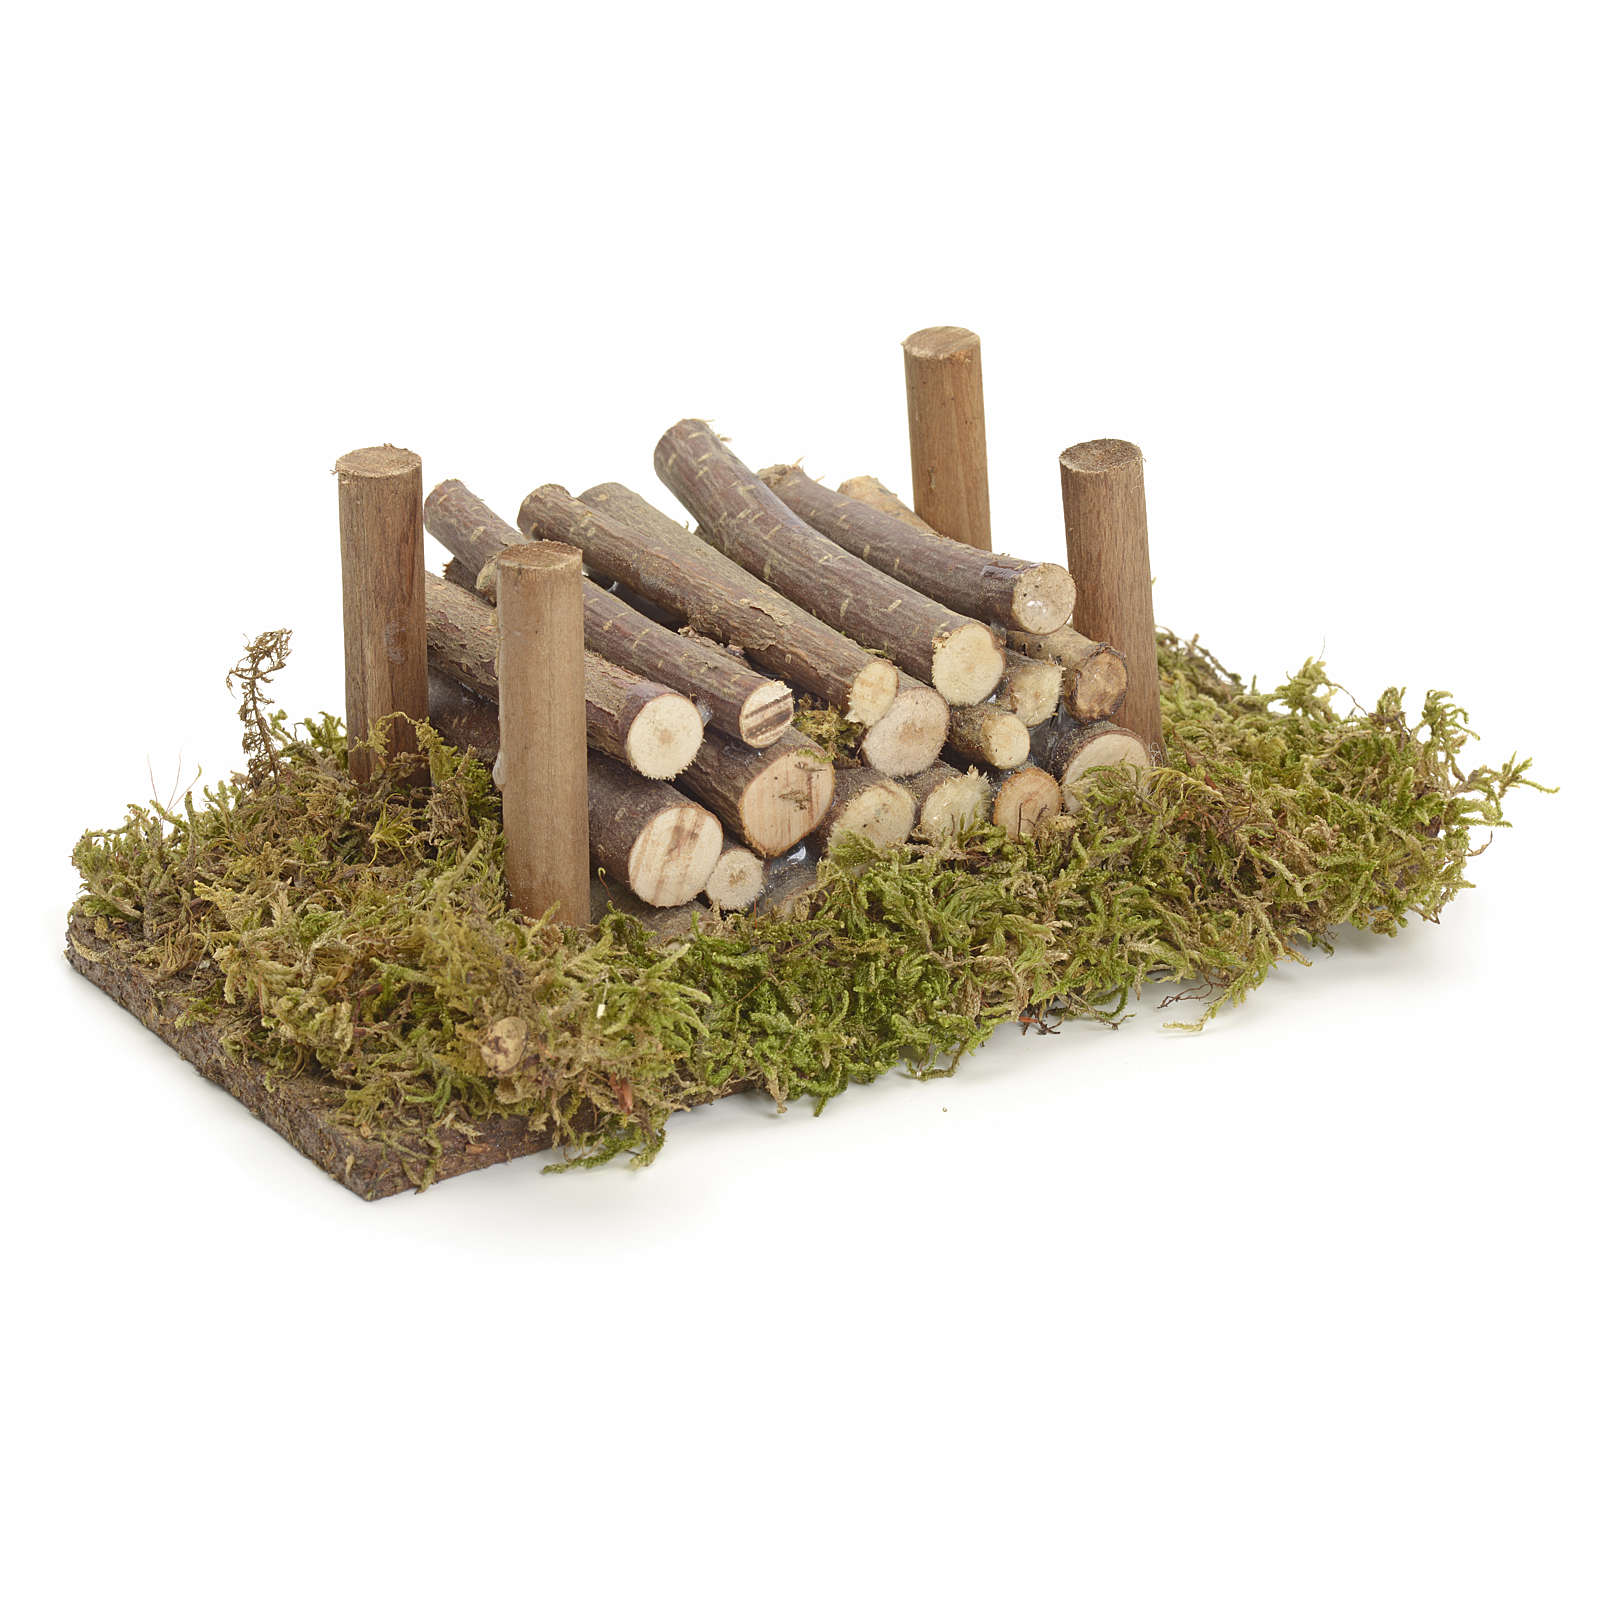 Nativity accessory, wood stack 4